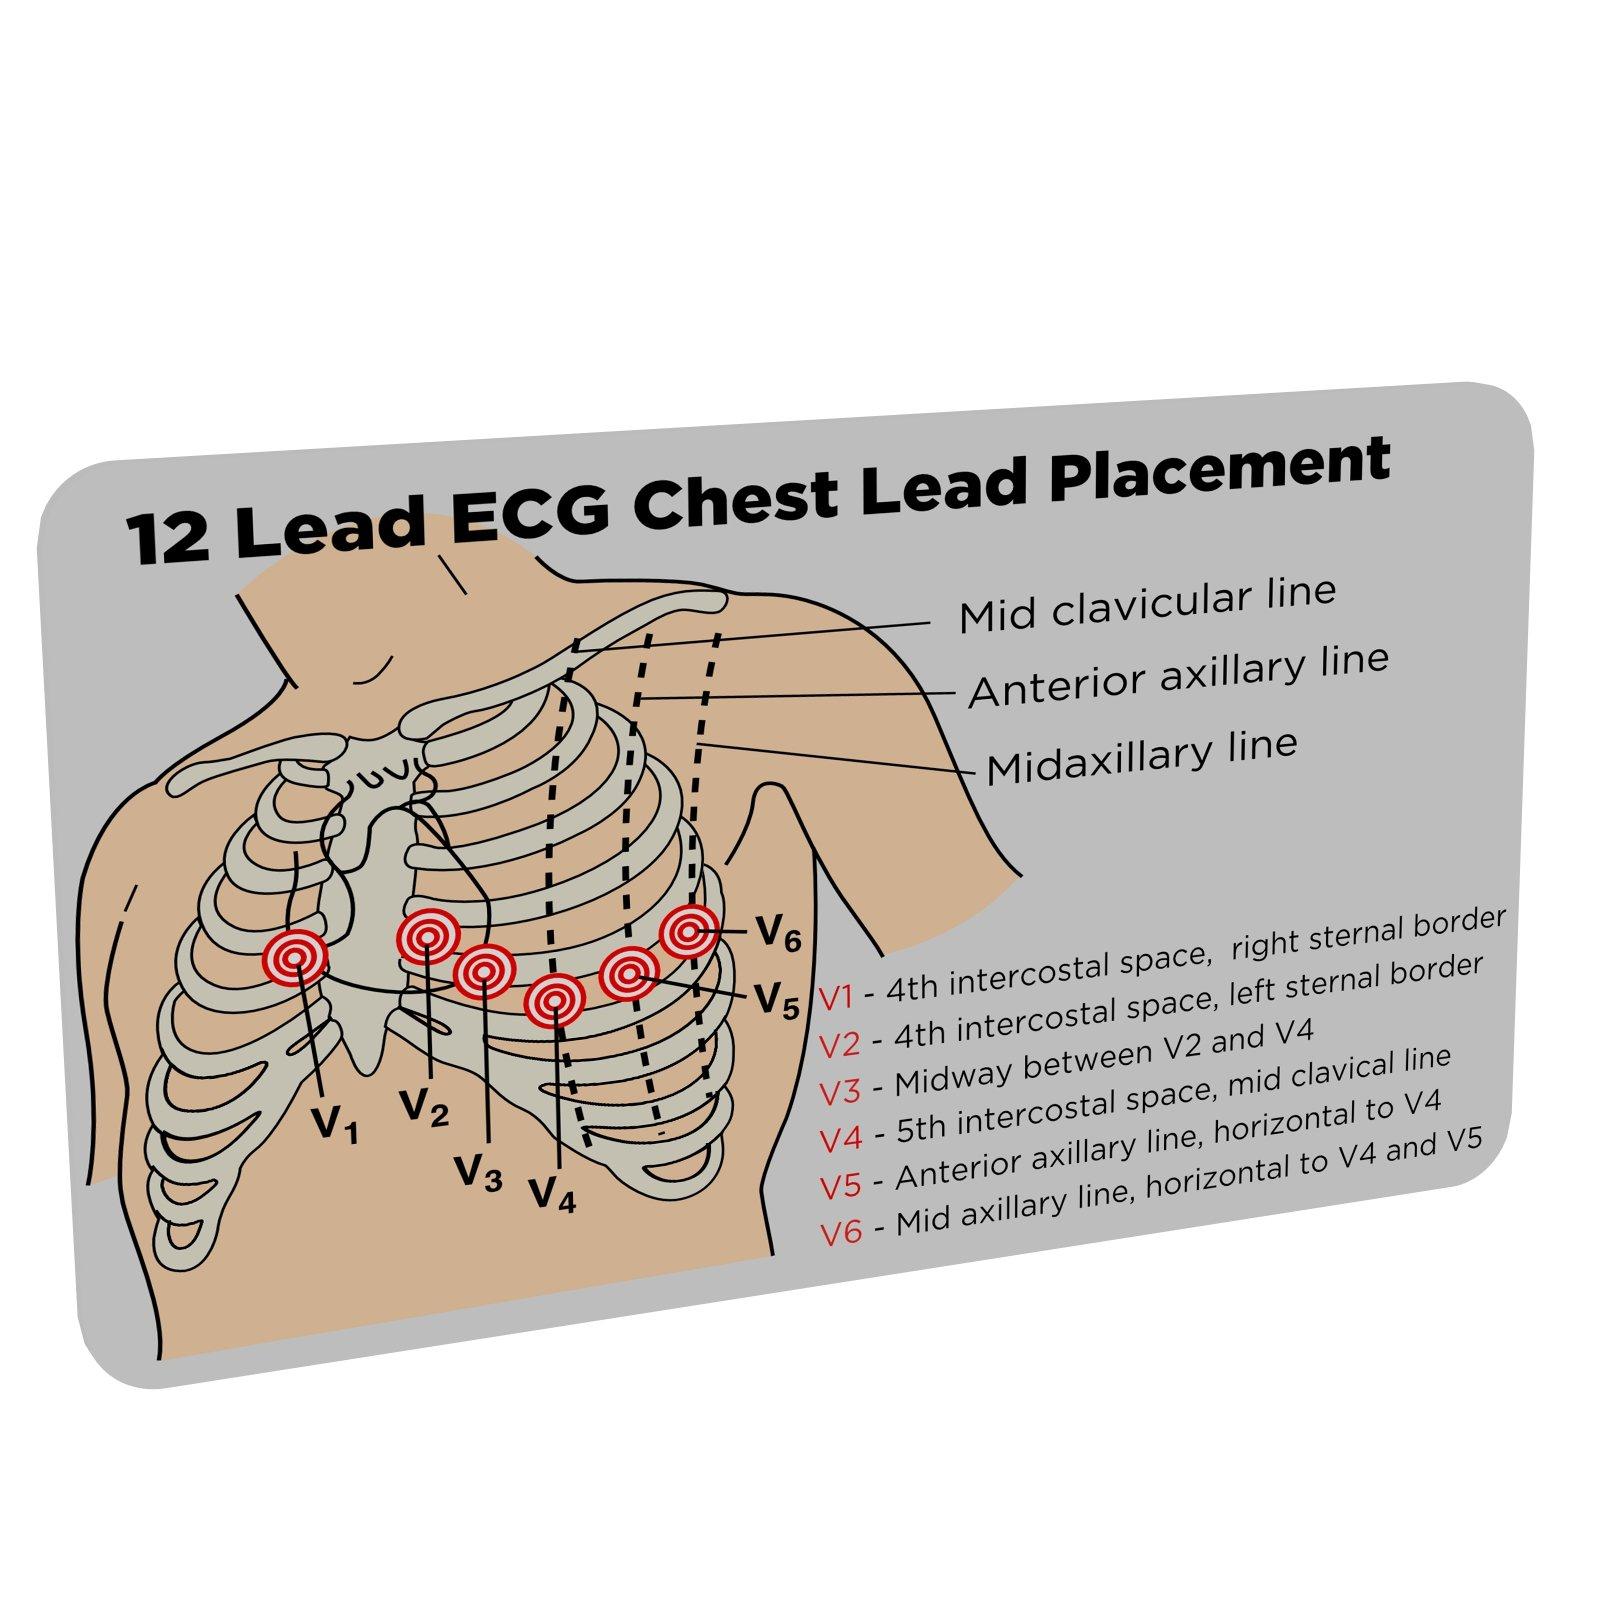 12 lead ecg chest lead placement (paramedic, nurse, ekg) pocket reference  card: amazon co uk: printedid cards: 0029882190654: books